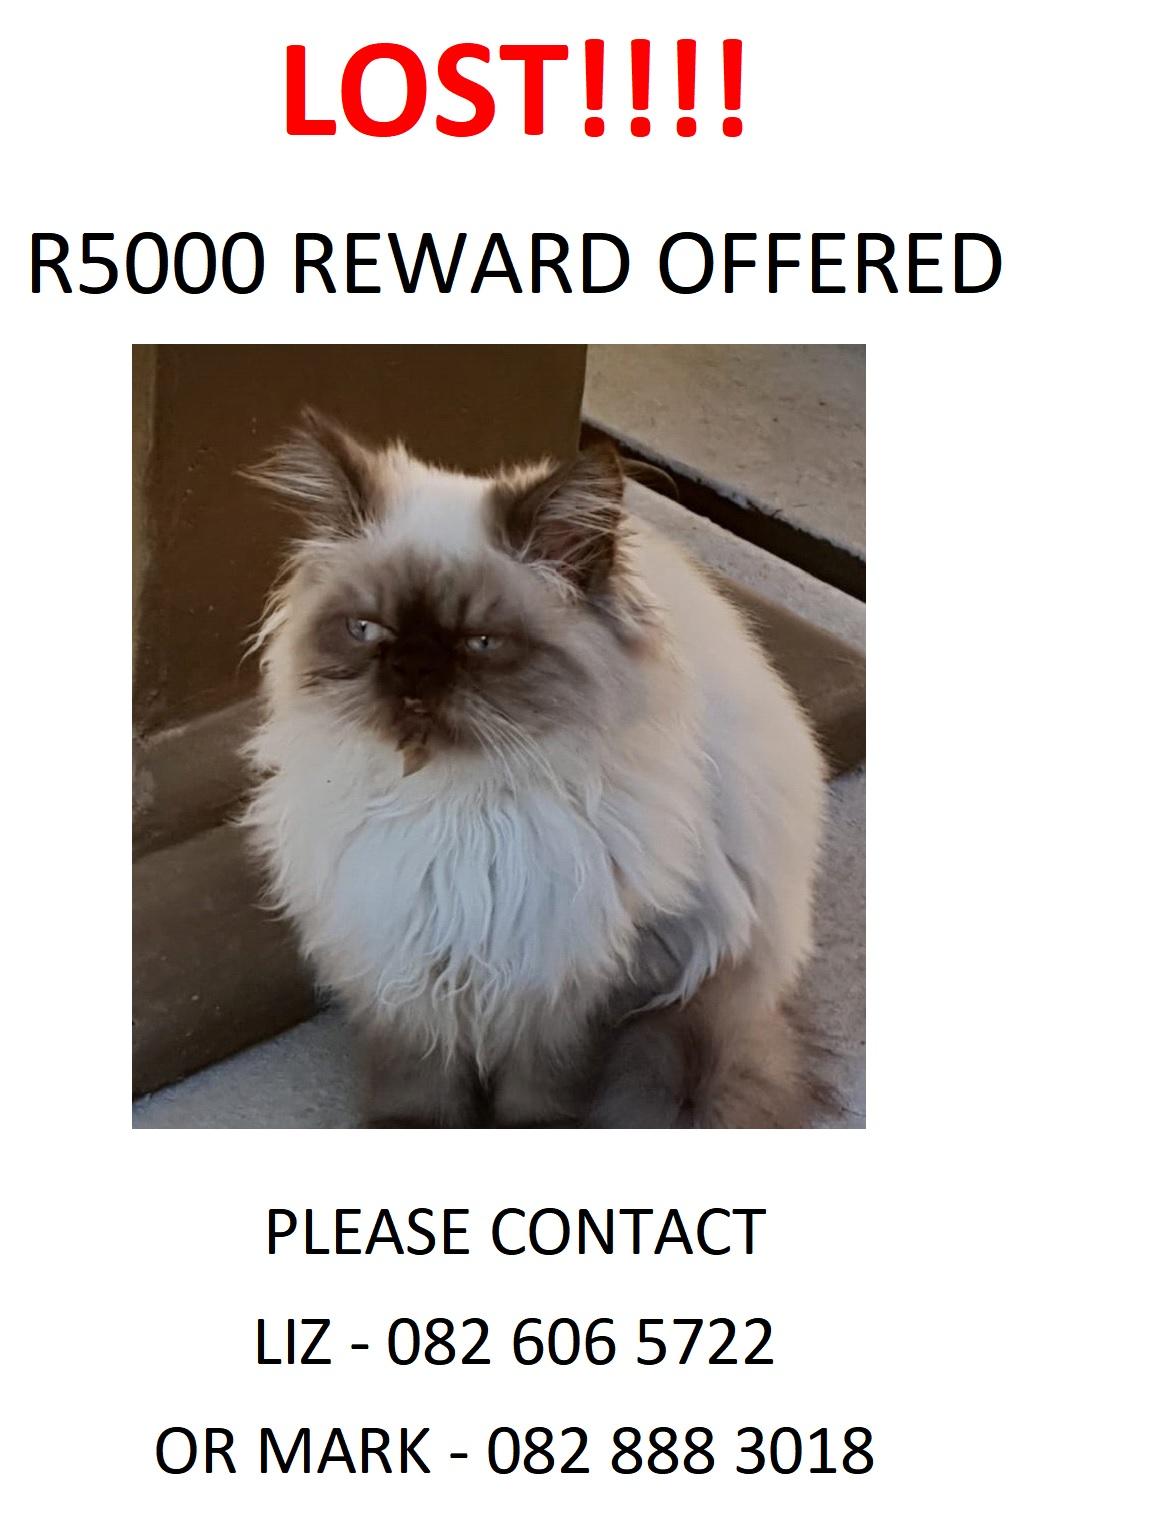 Lost, missing or stolen Persian Kitten